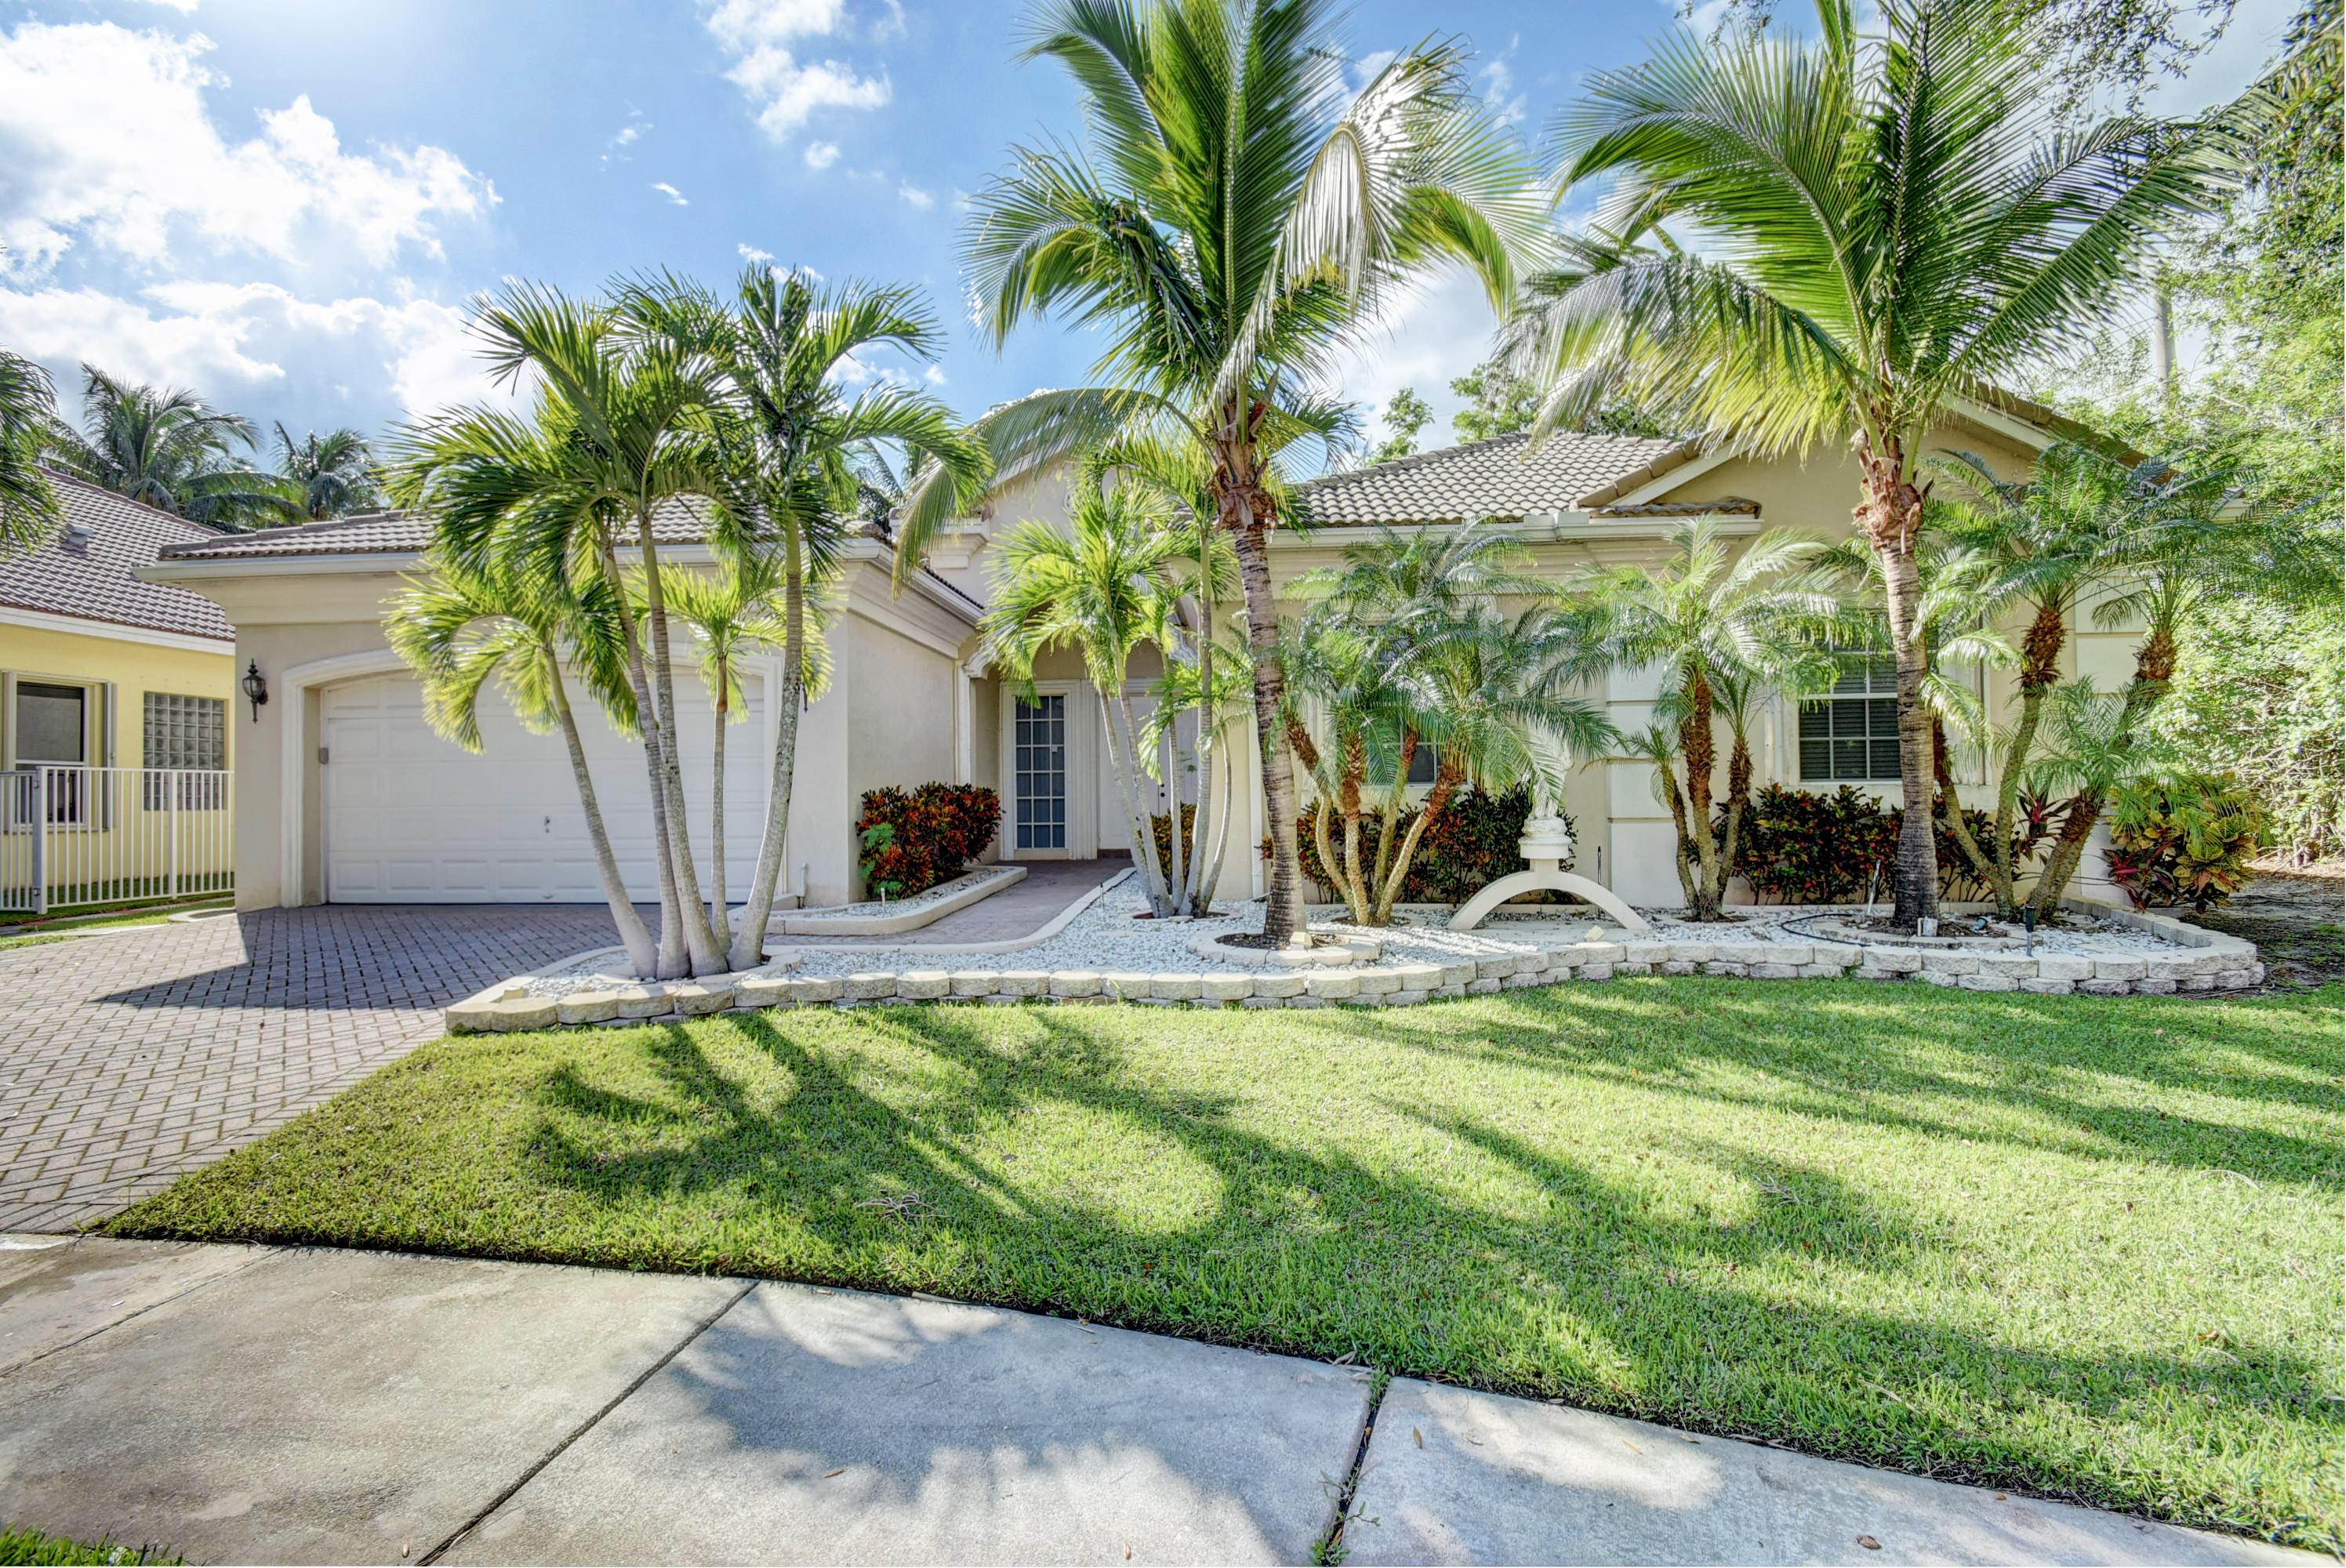 9695 Palma Vista Way Boca Raton, FL 33428 RX-10378265